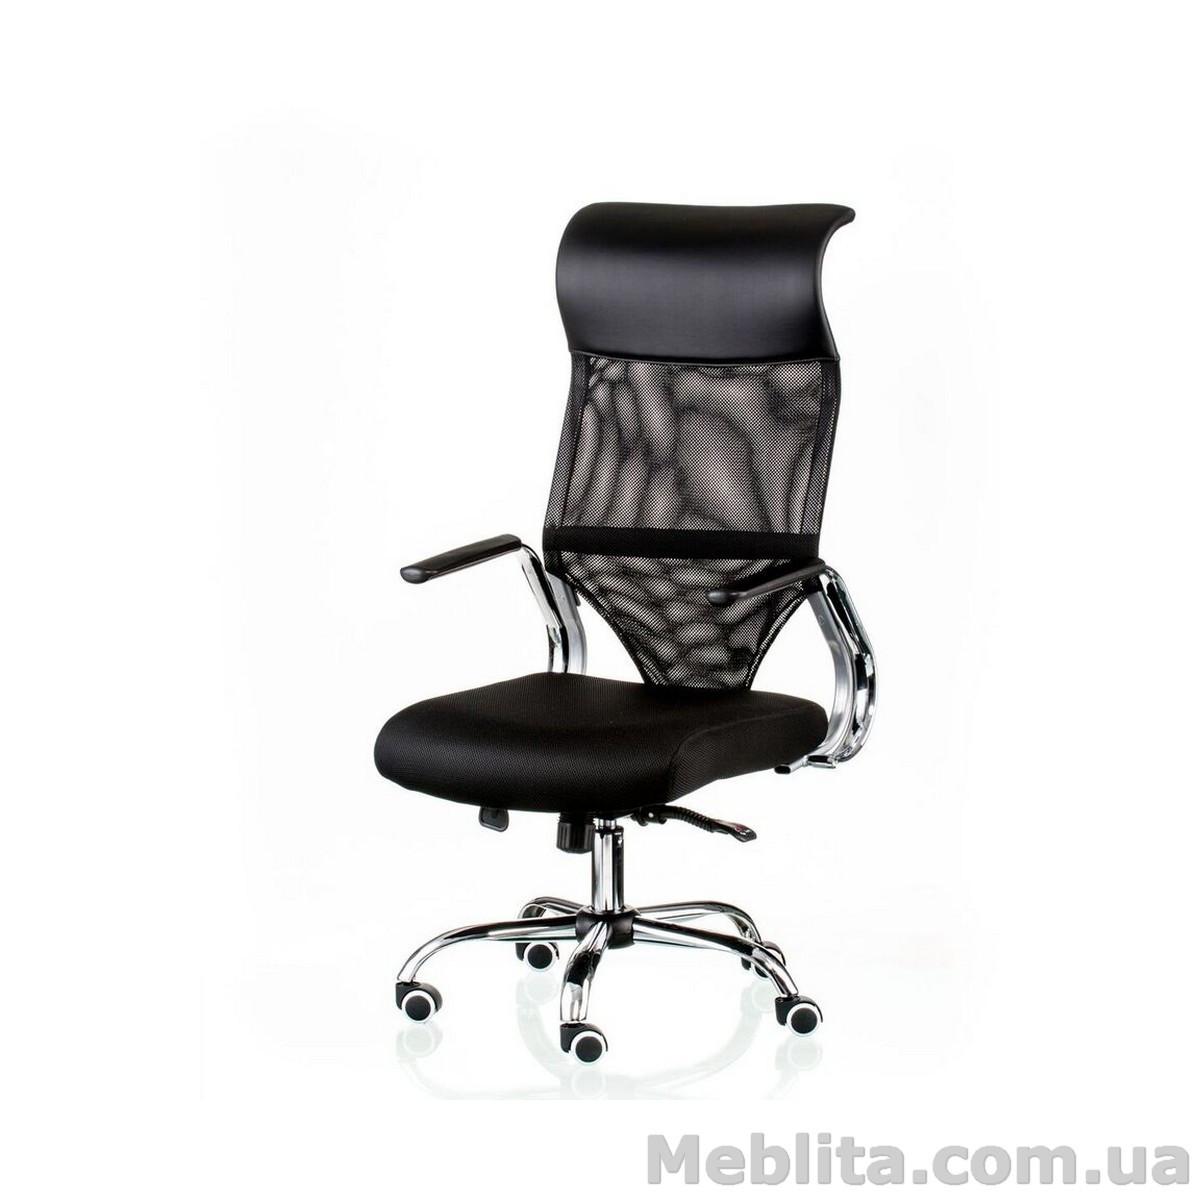 Кресло офисное Suprеmе 2 Black Special4You